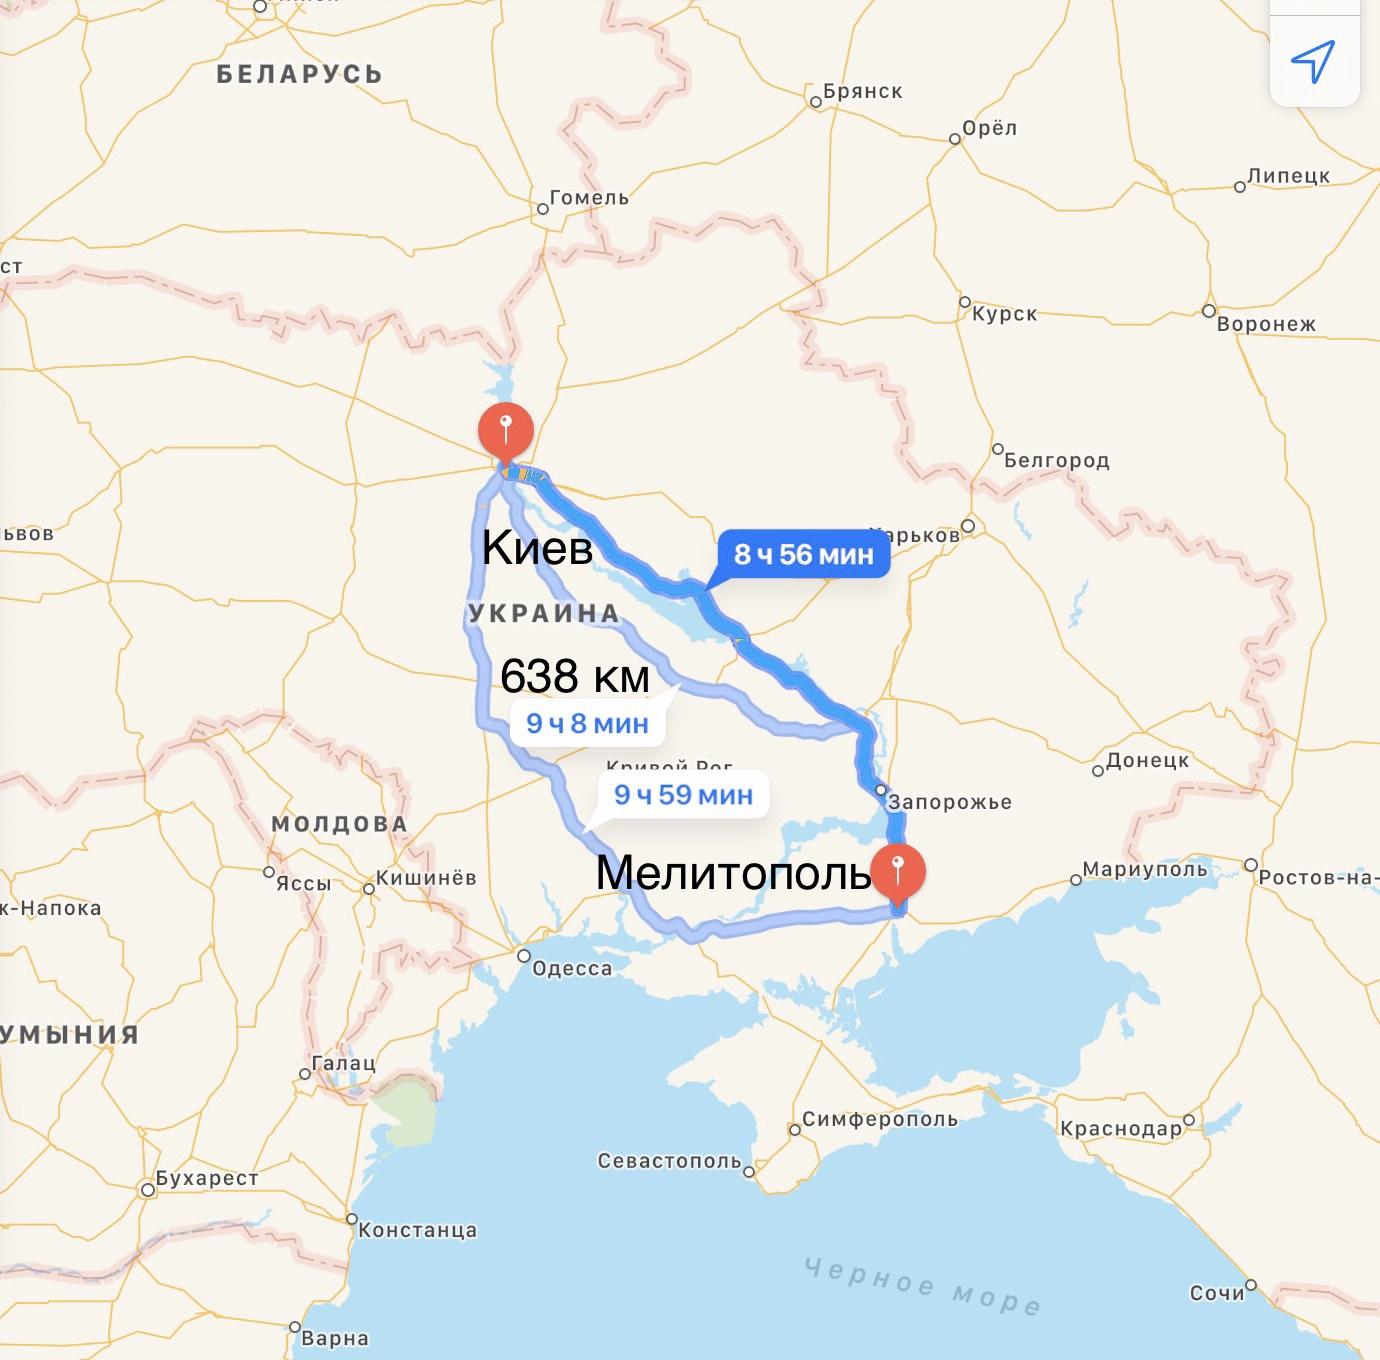 Грузоперевозки Киев – Мелитополь